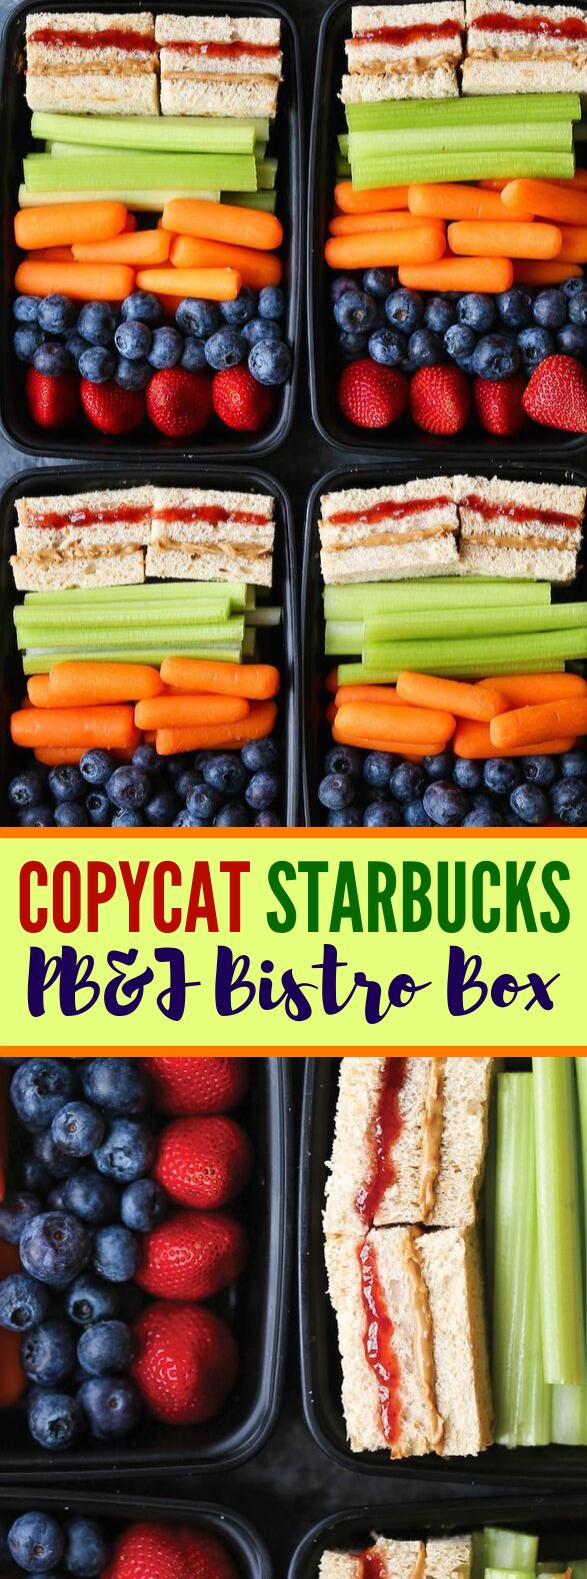 COPYCAT STARBUCKS PB&J BISTRO BOX #healthylunch #diet